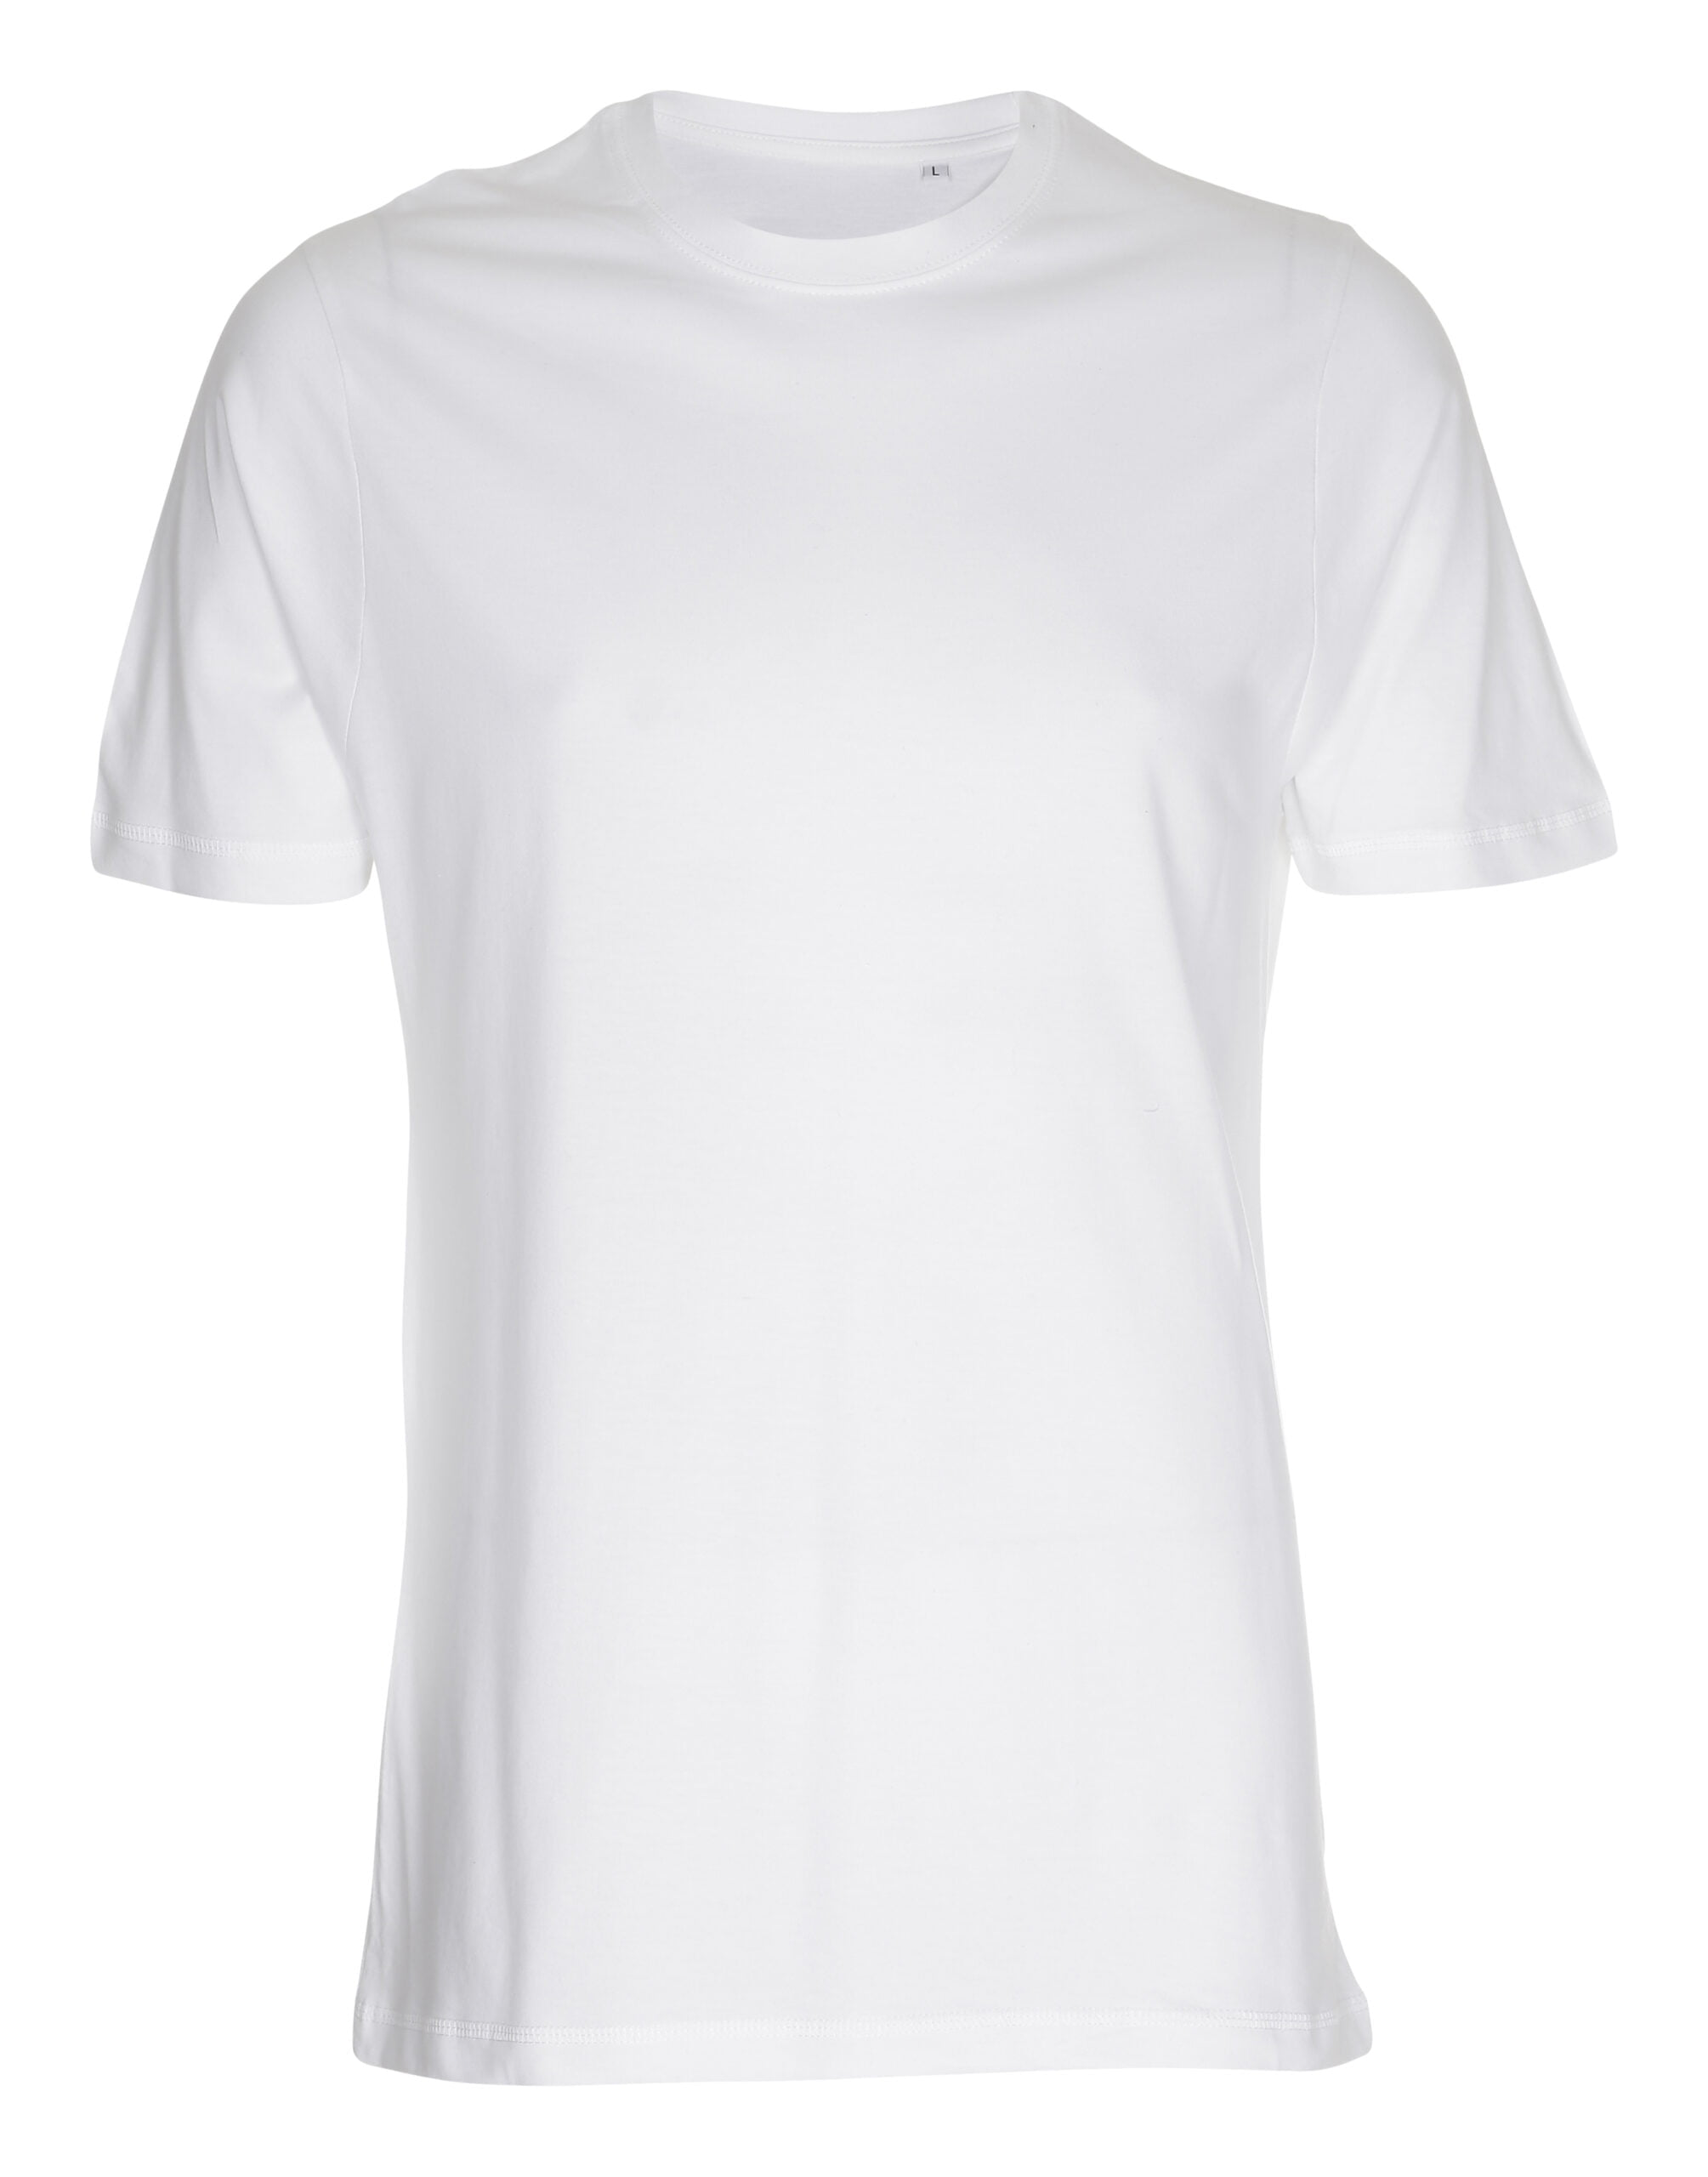 Xtreme Stretch T-shirt Hvid